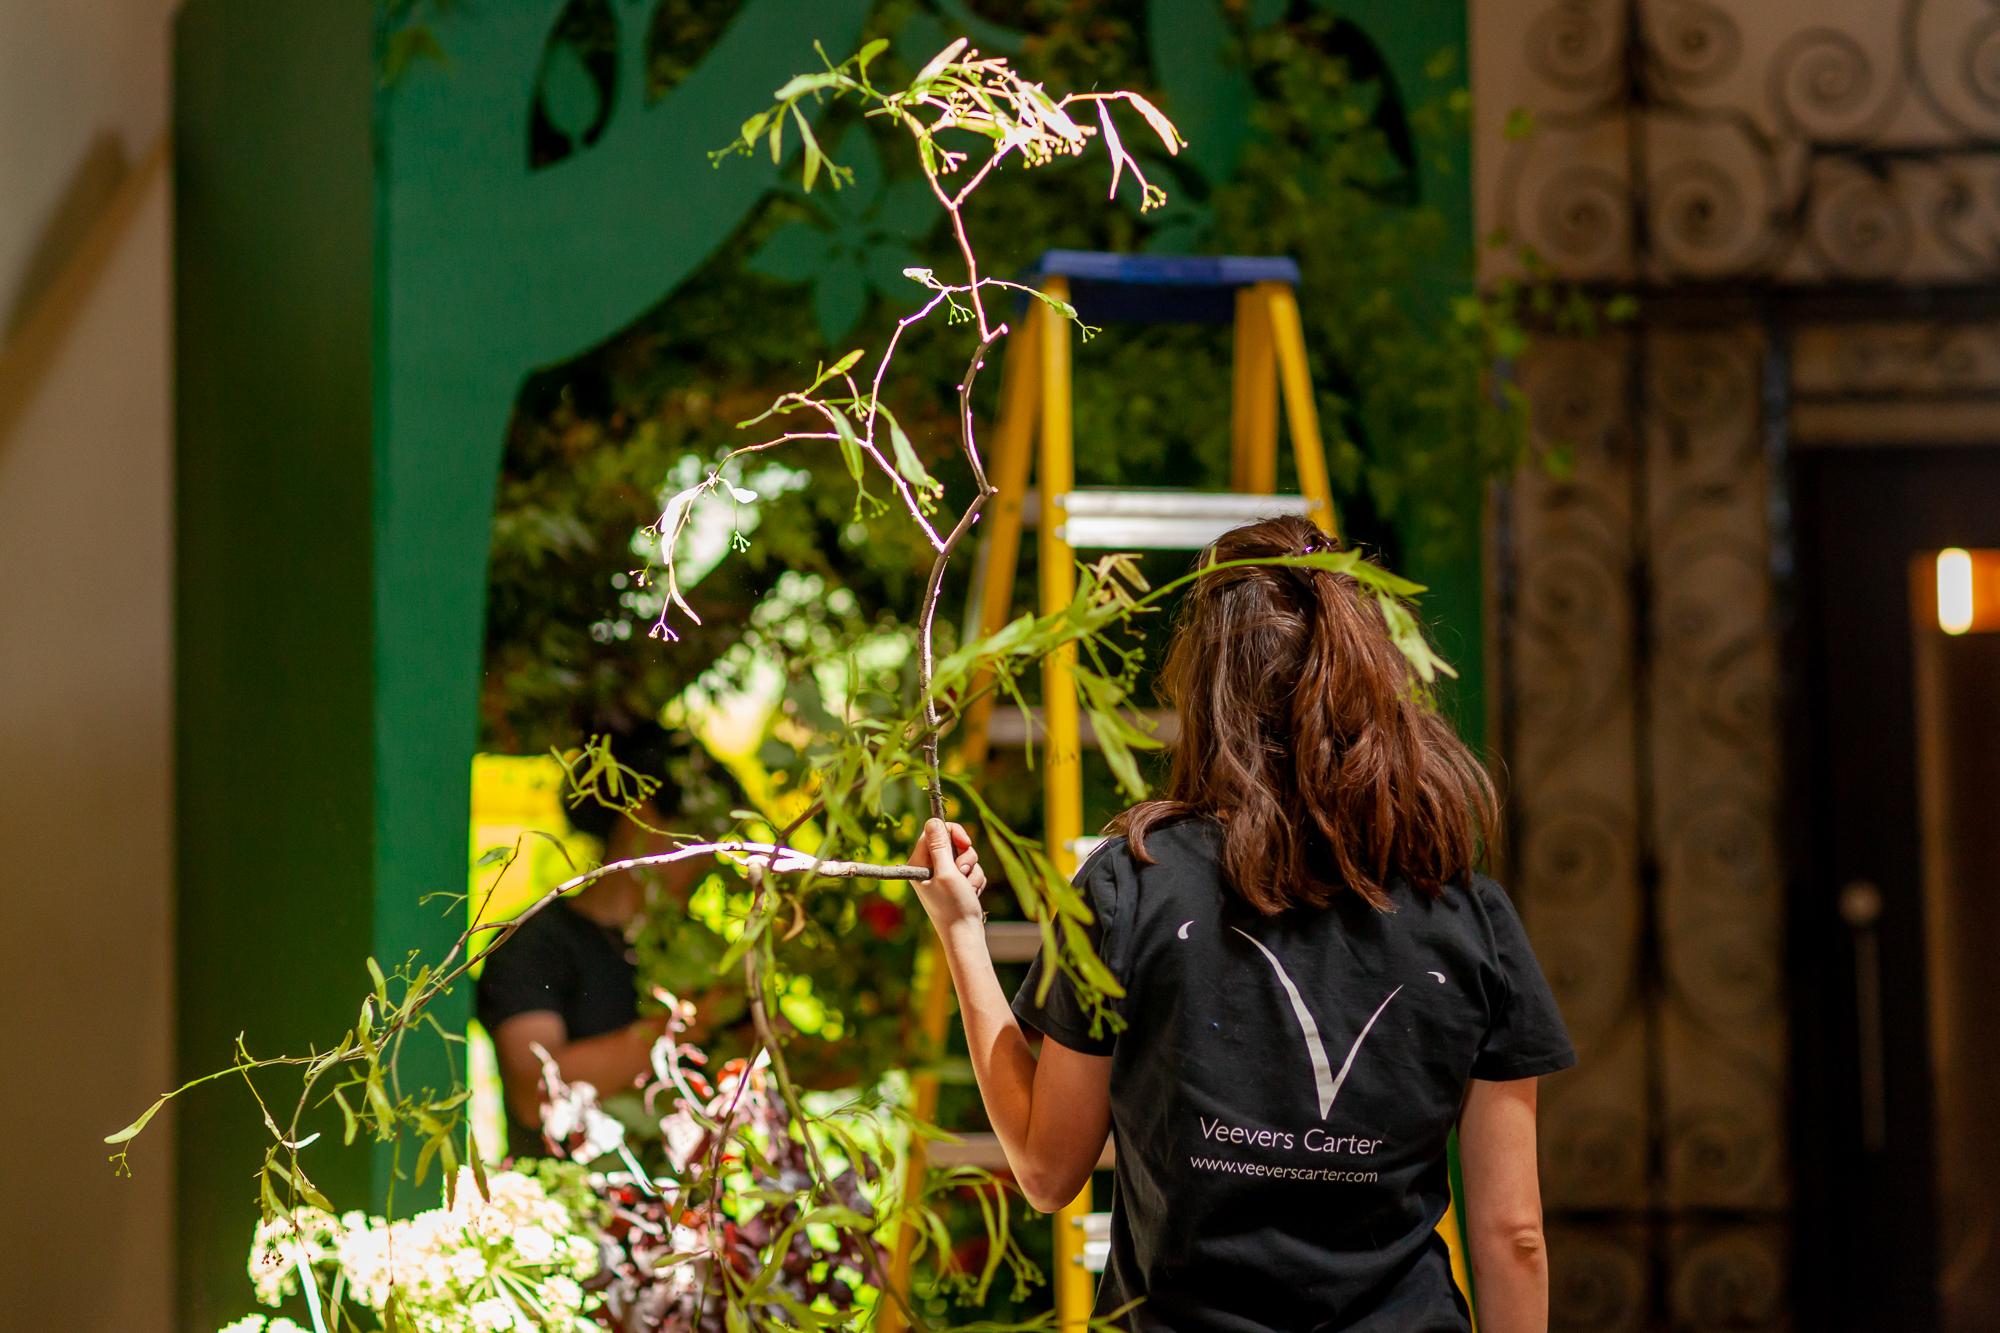 Veevers-Carter-installation-British-Flowers-Week-2018-at-Garden-Museum-by-New-Covent-Garden-Market (2).jpg